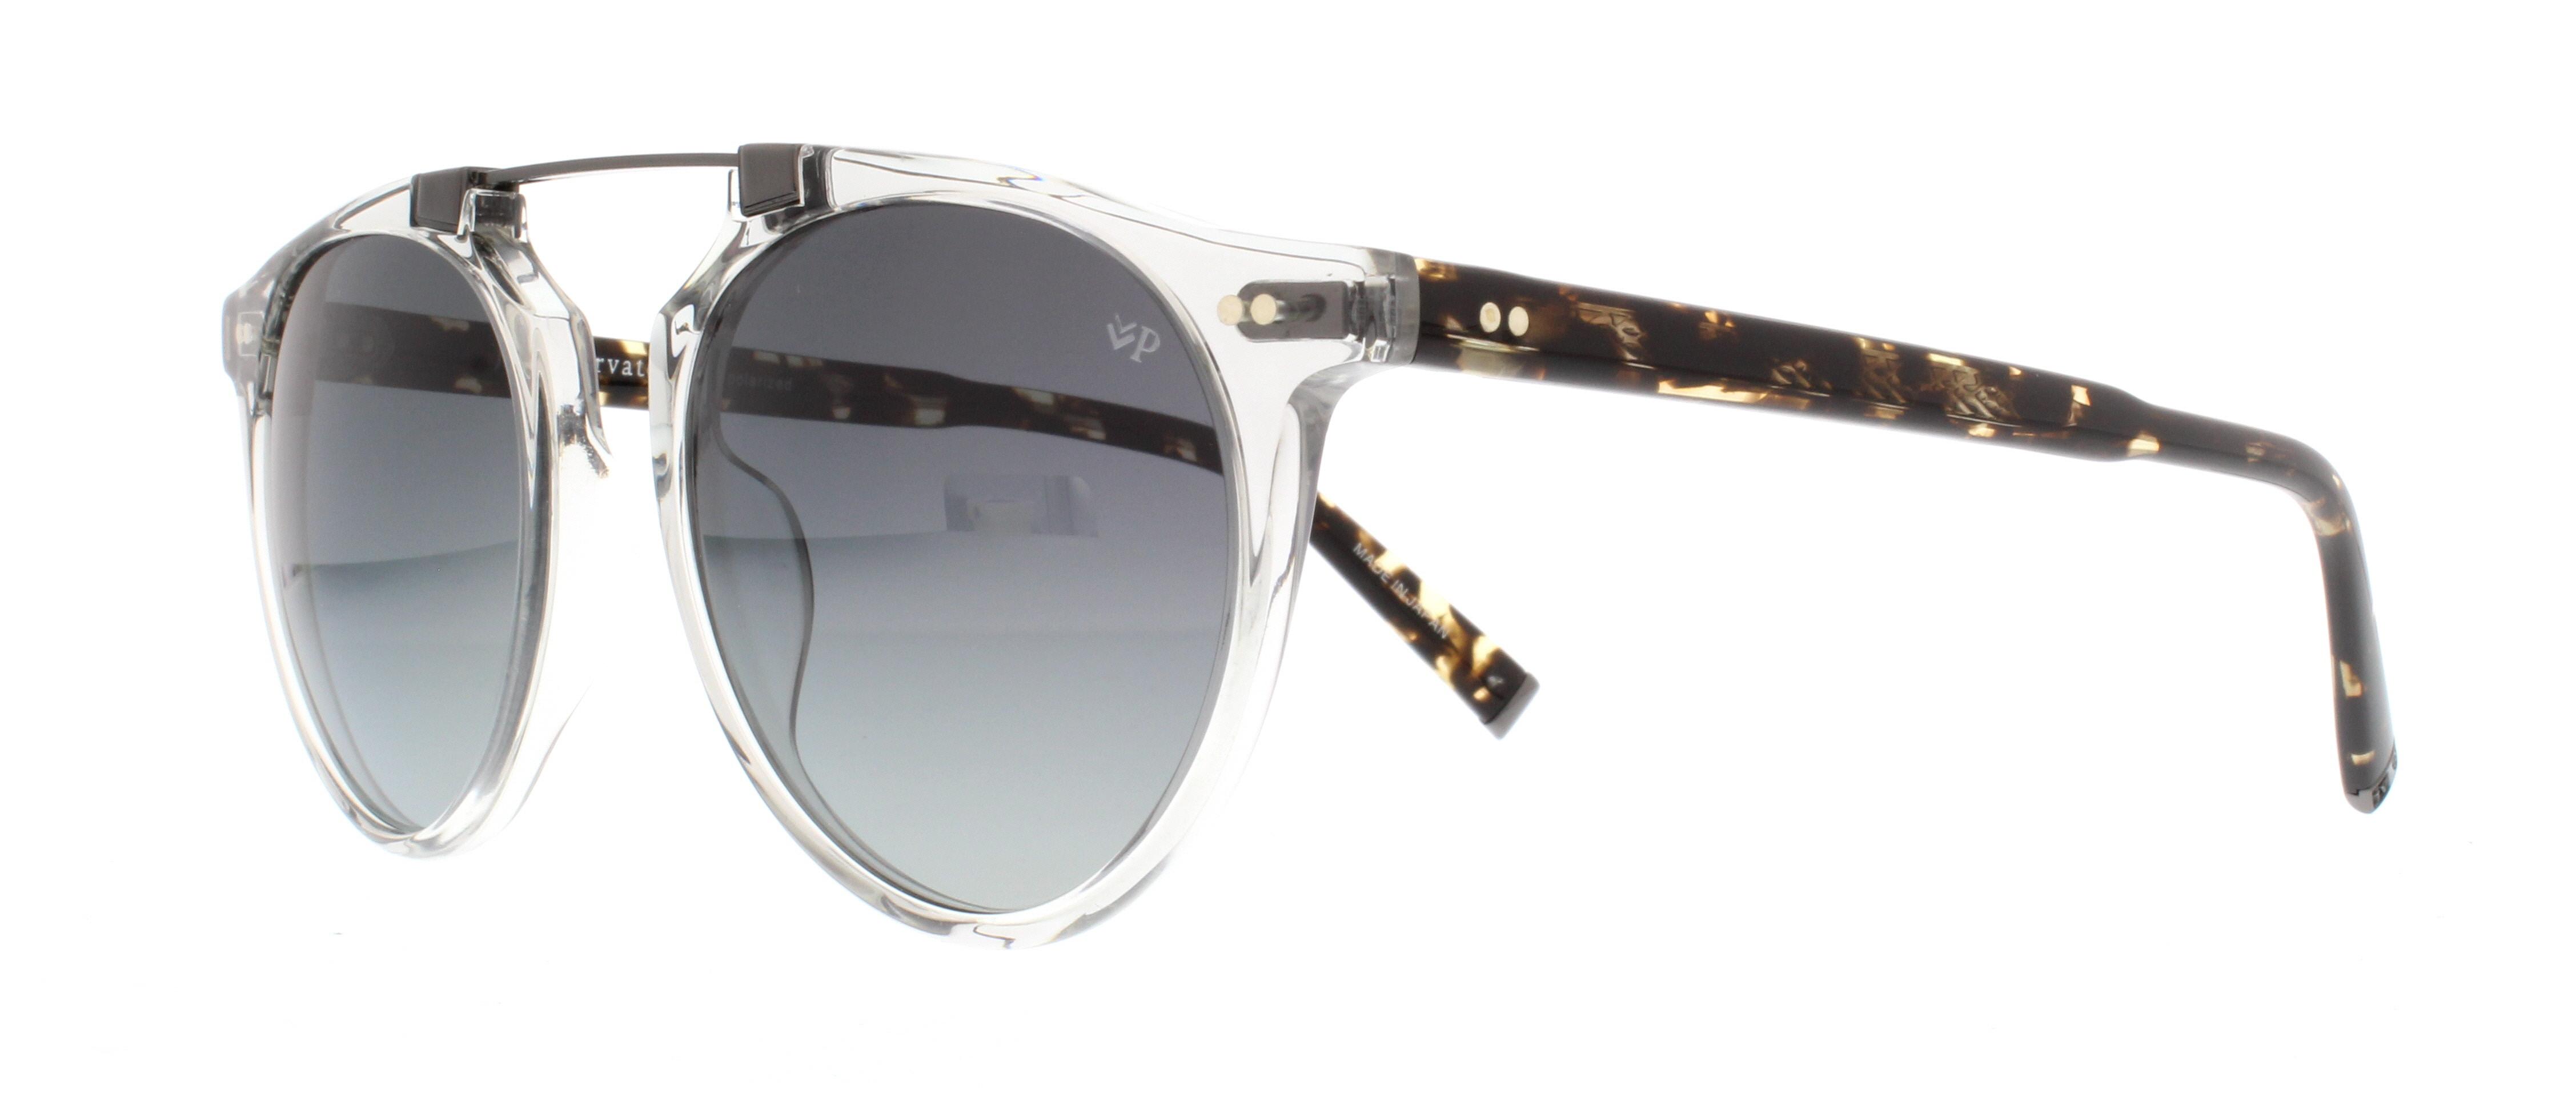 51d374ac6a JOHN VARVATOS Sunglasses V602 UF Grey Crystal 52MM 751286276947